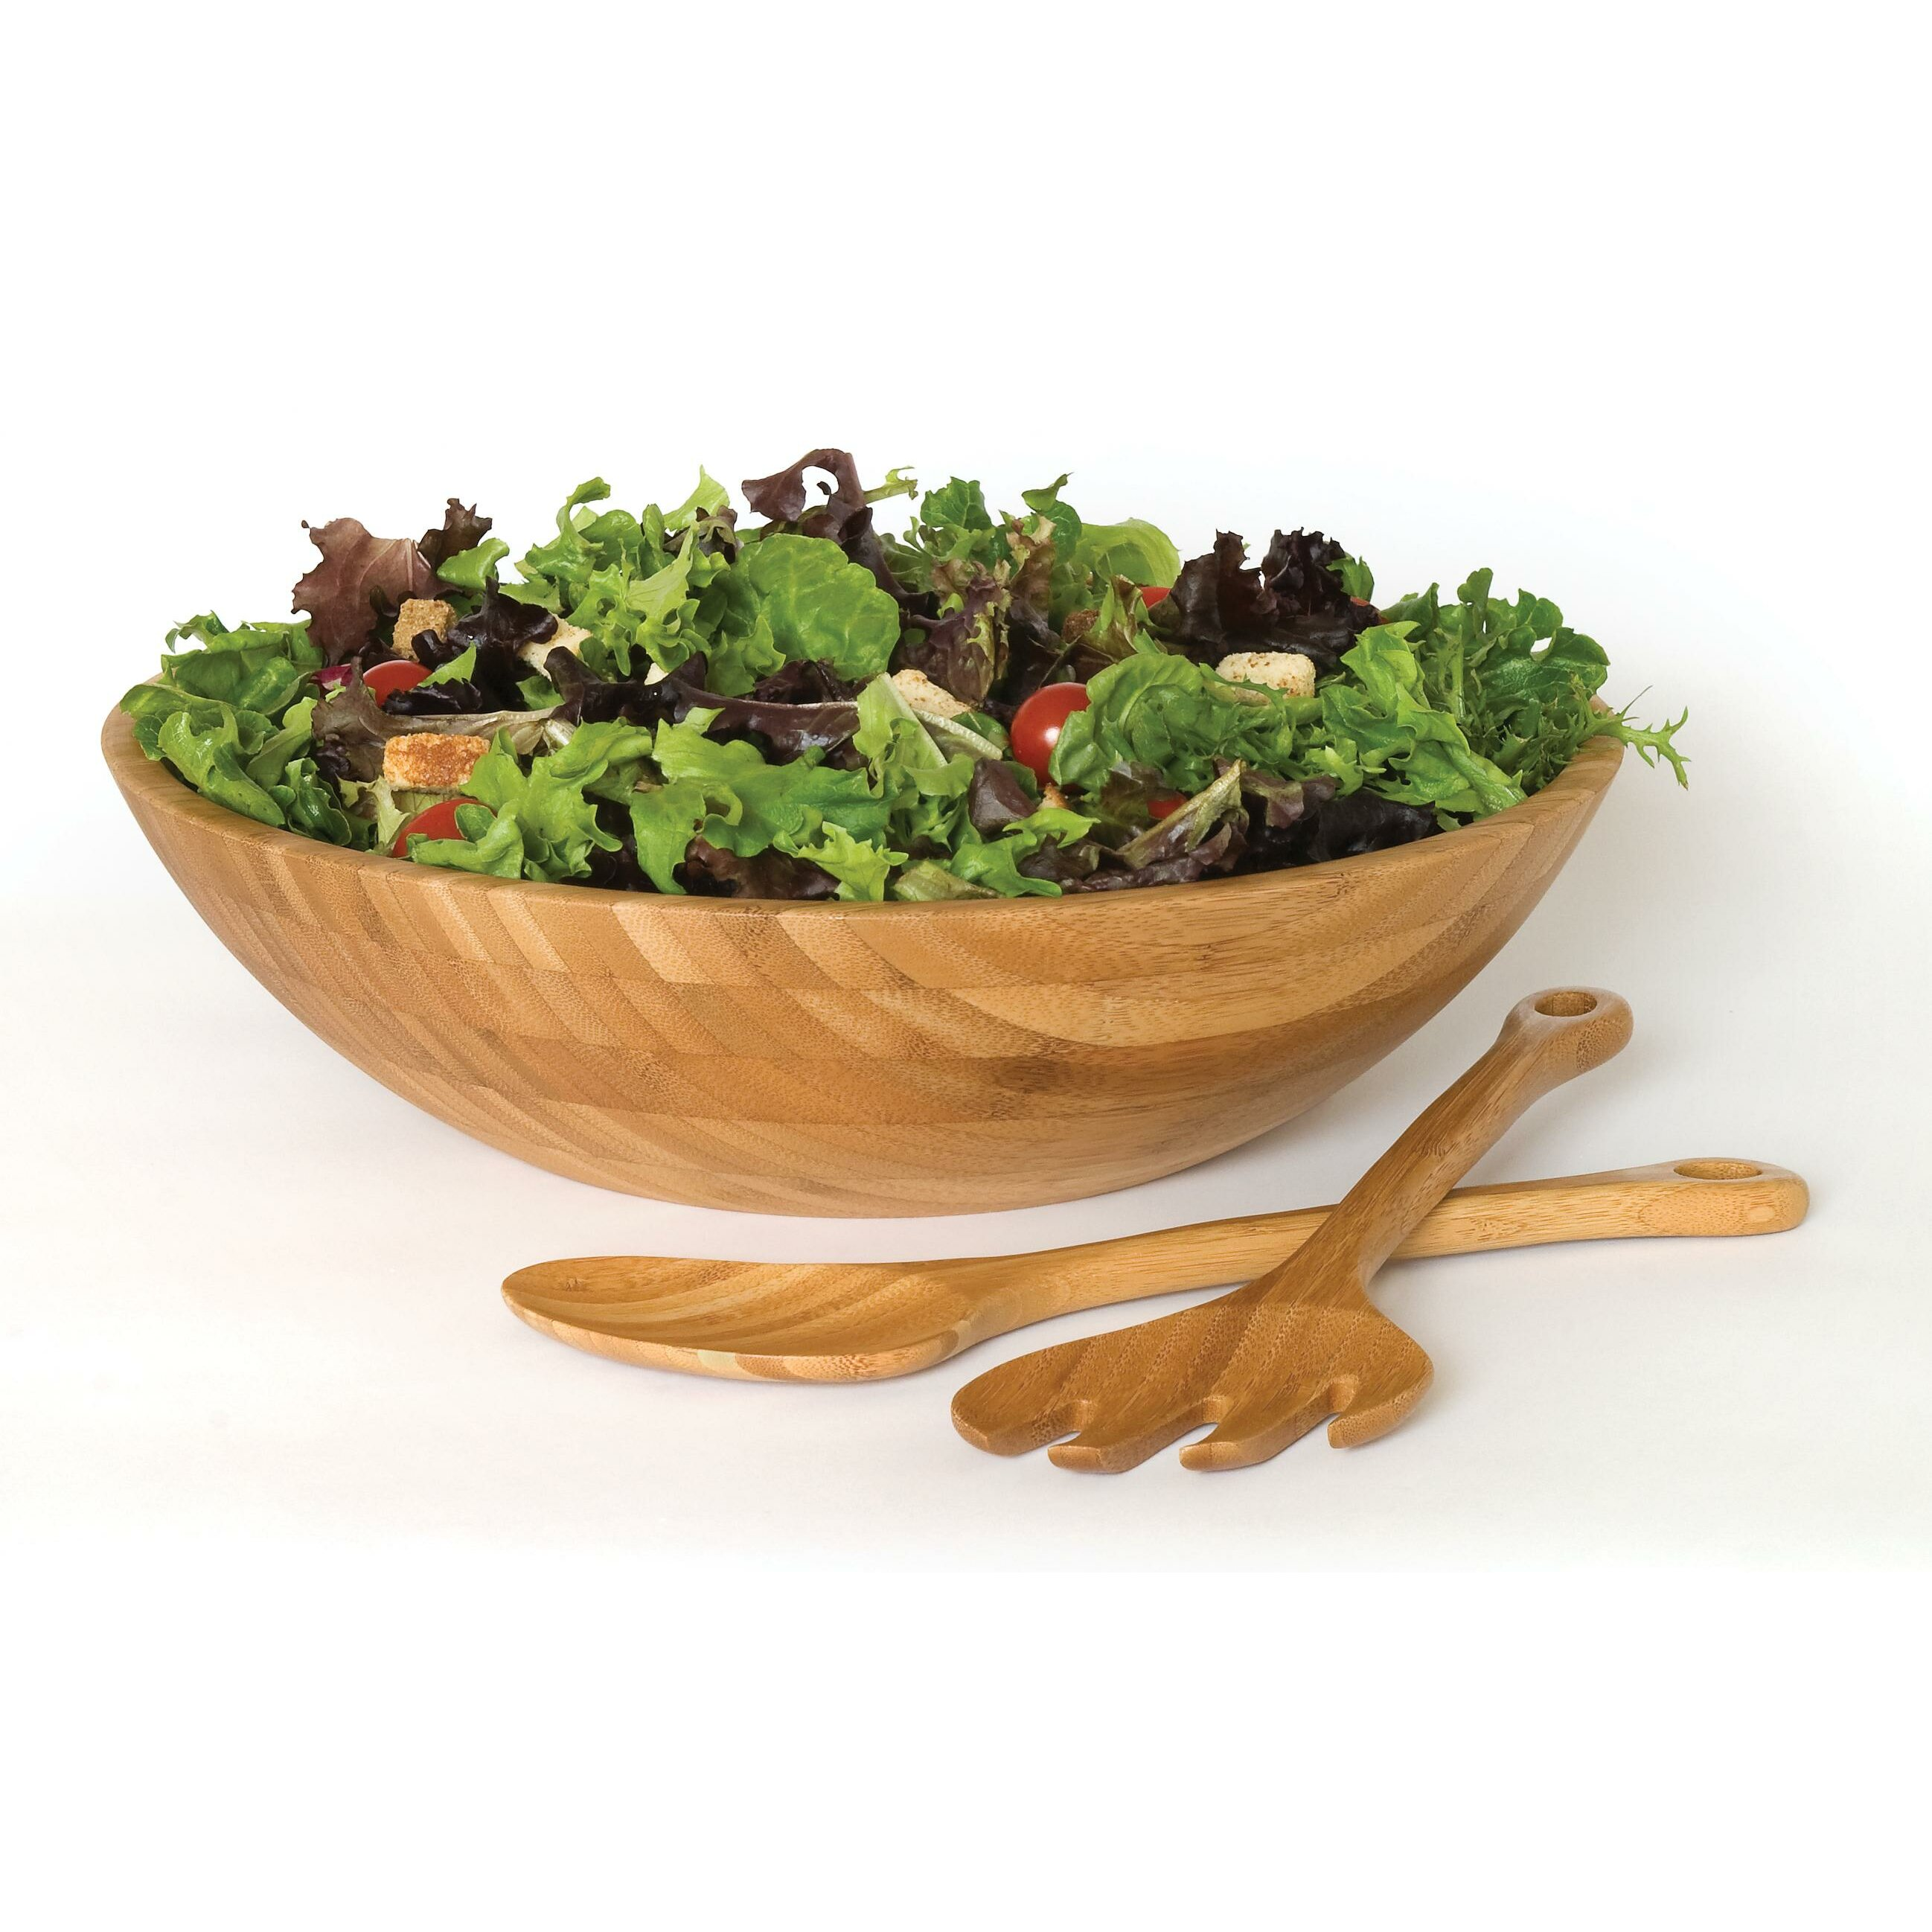 Lipper International Bamboo Salad Bowl 3 Piece Set